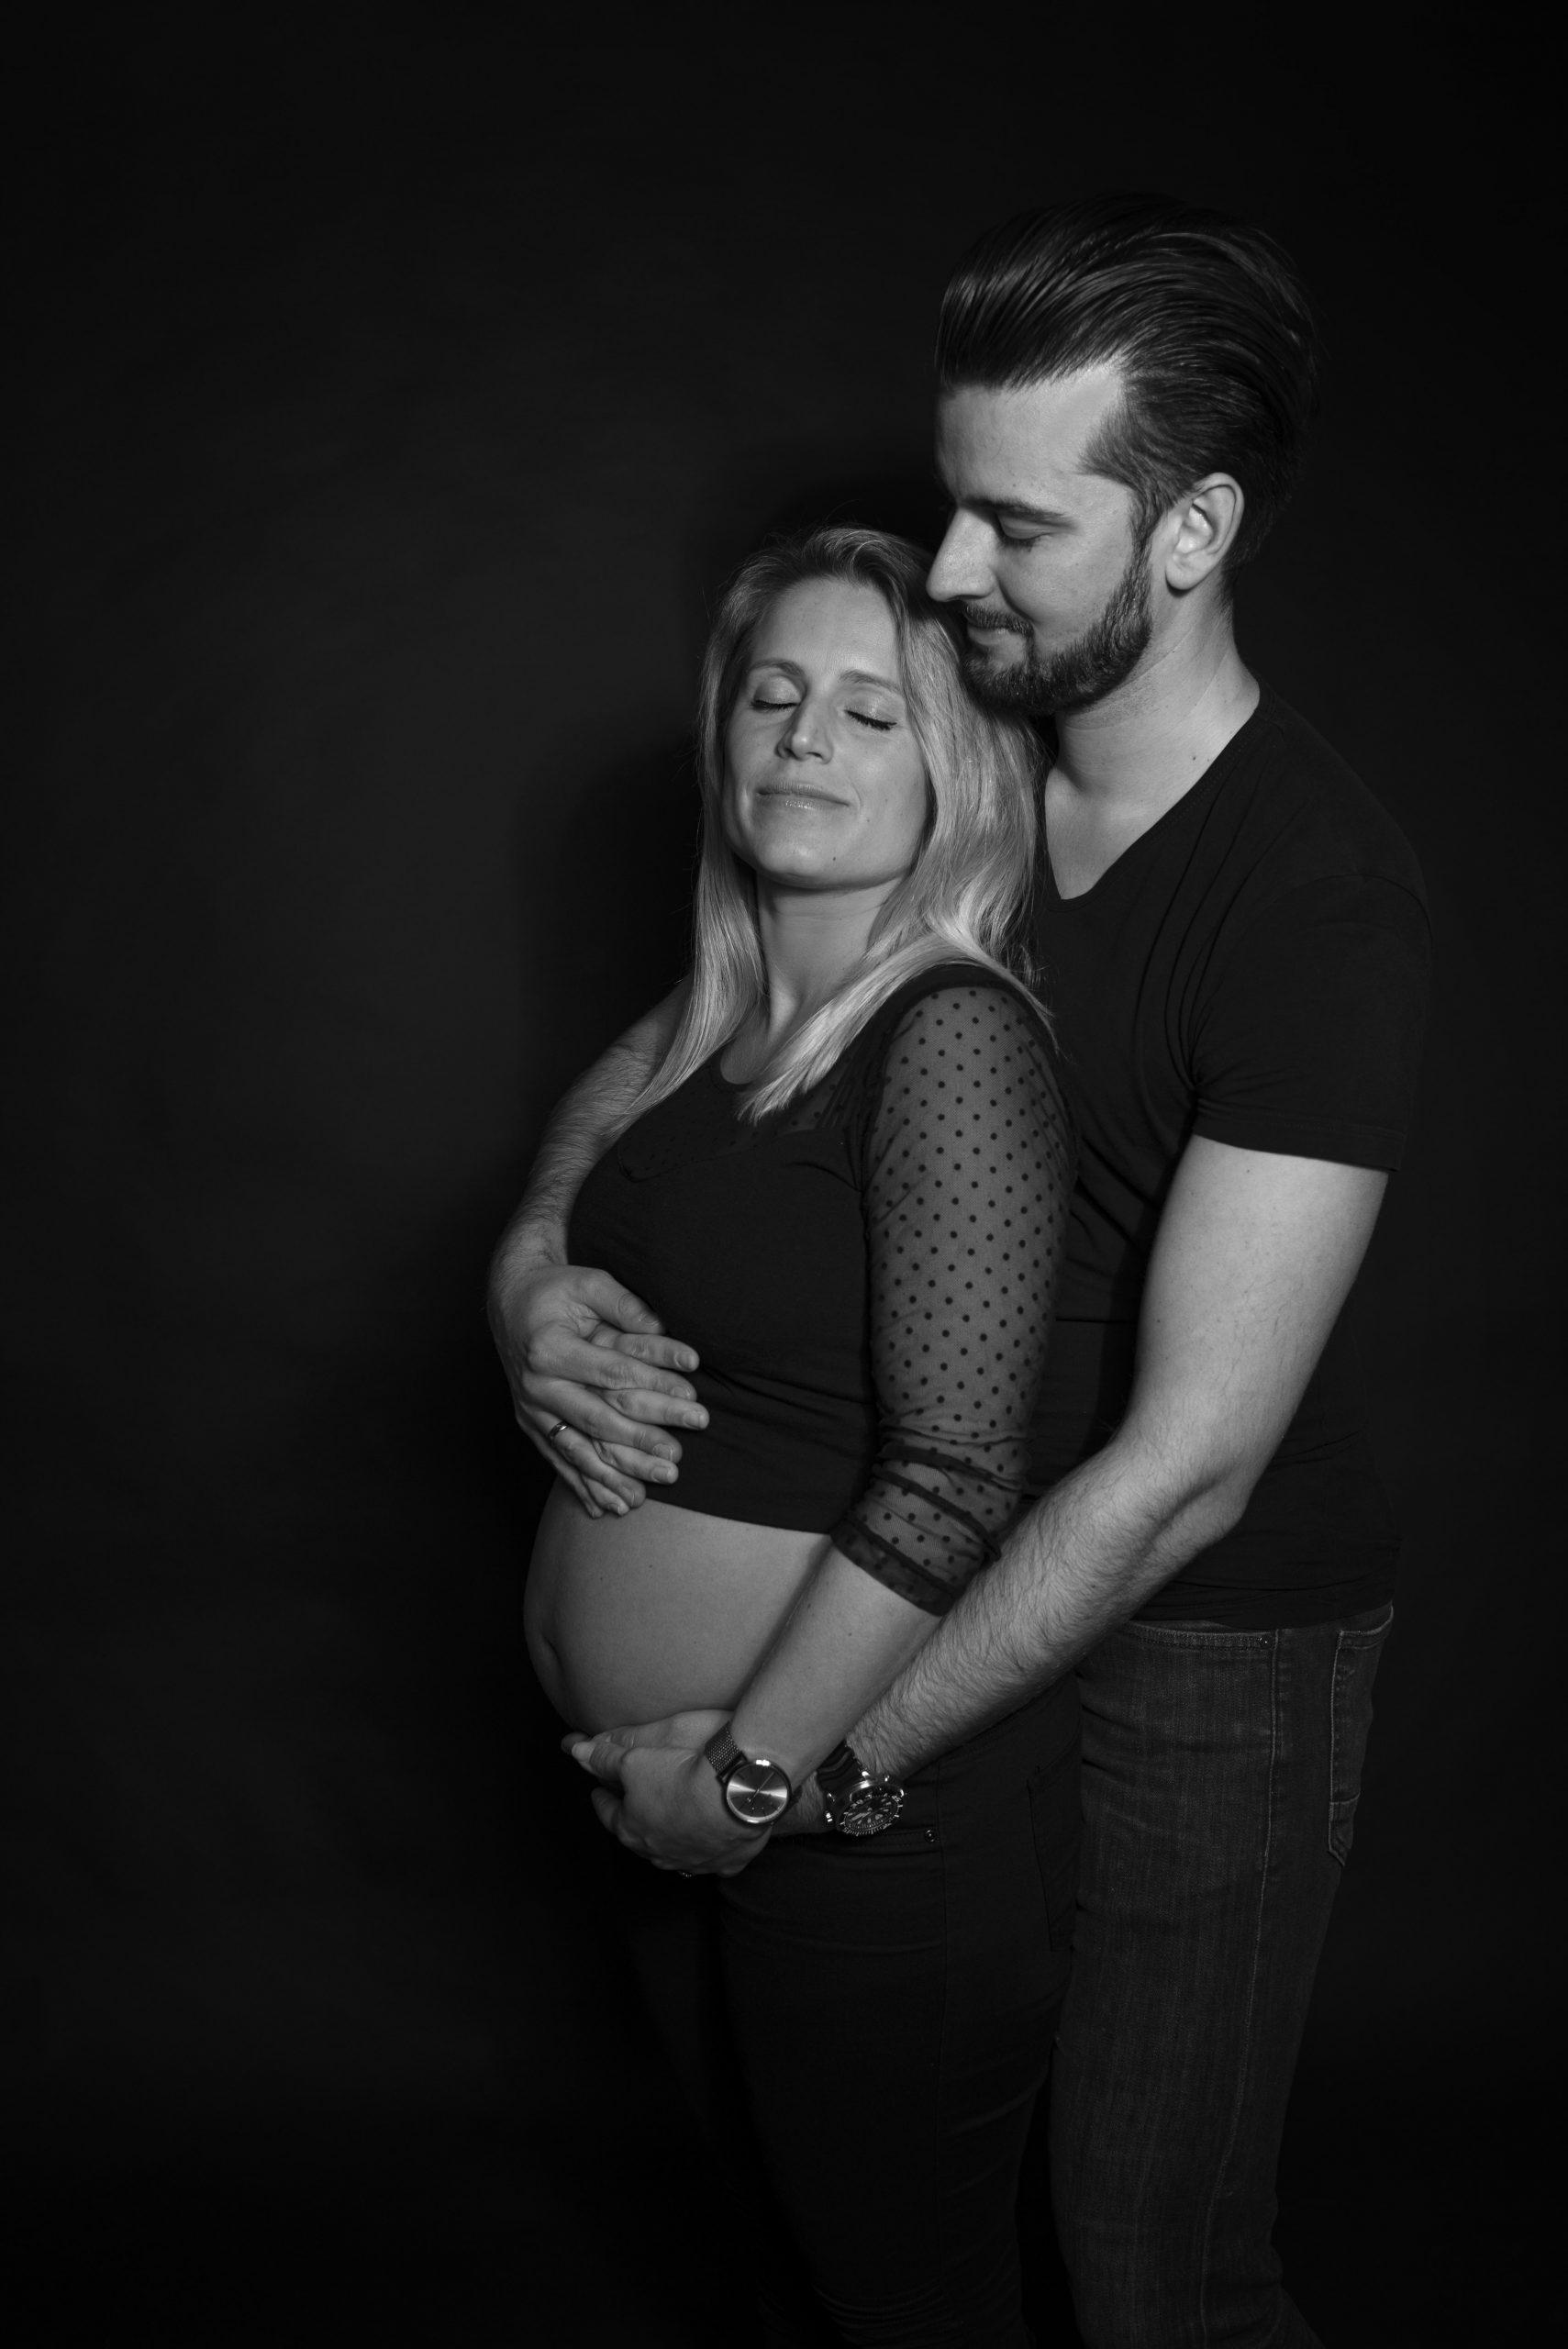 Zwangerschapsreportage S&HJ